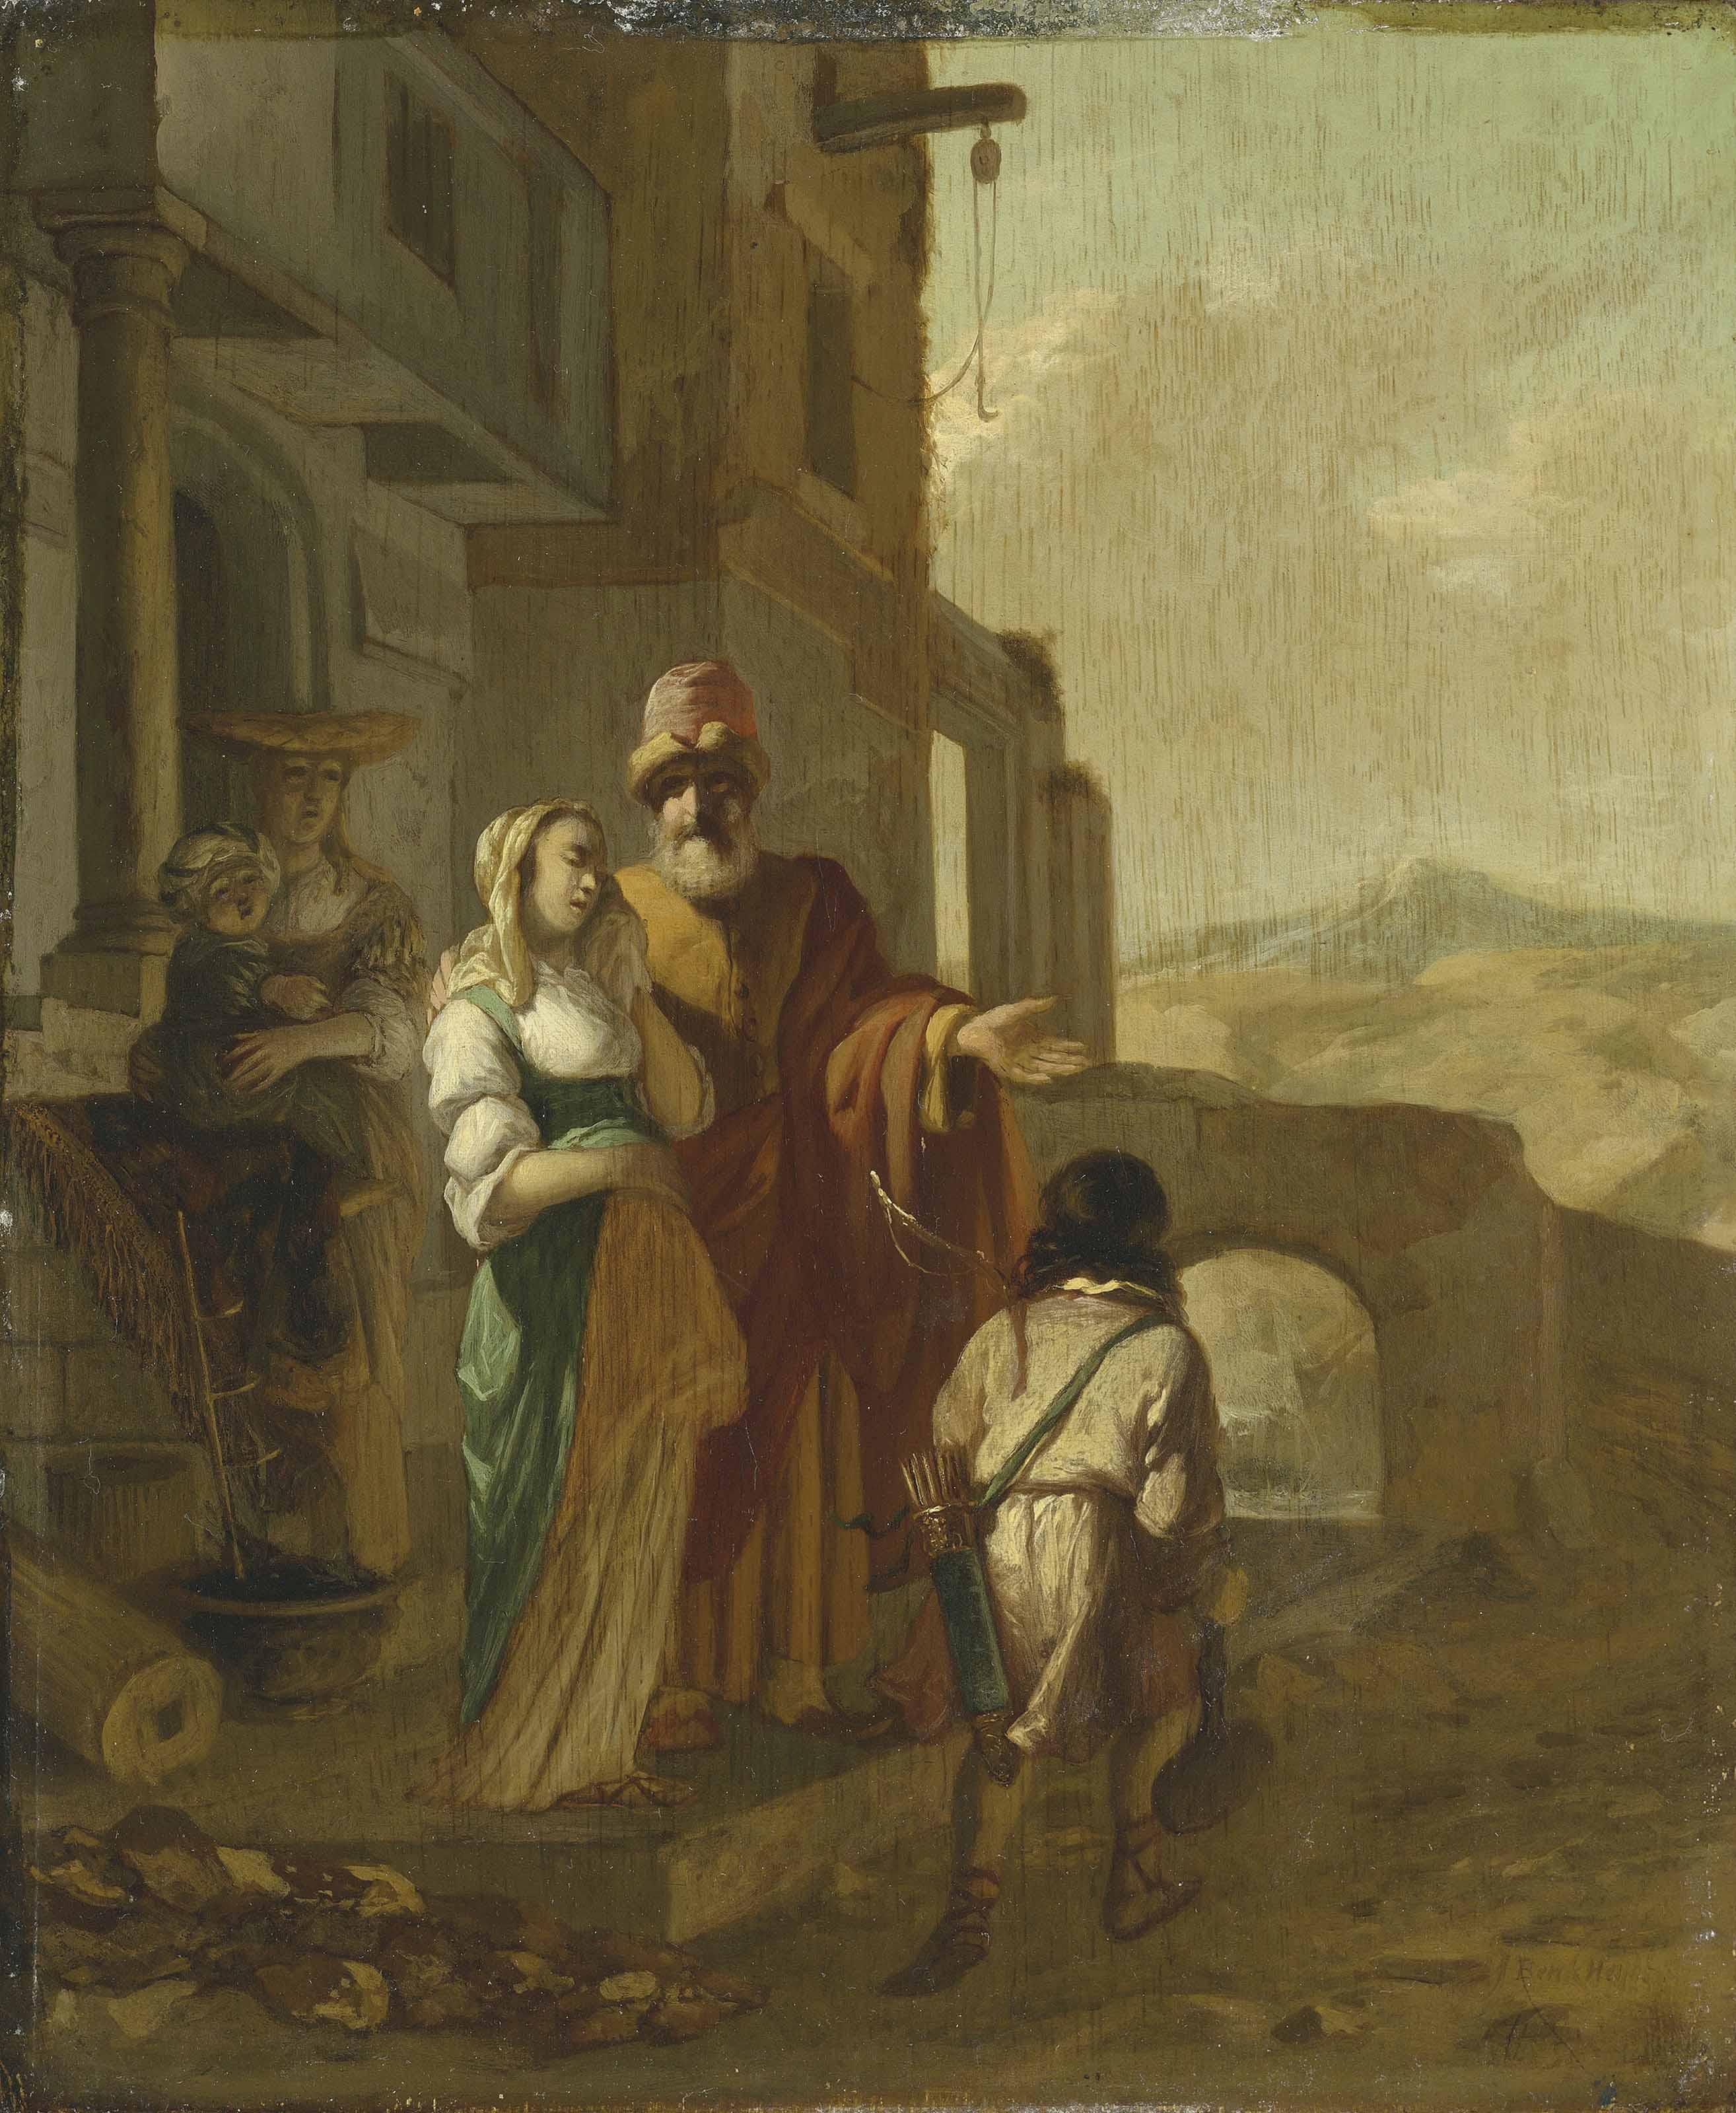 The banishment of Hagar and Ishmael